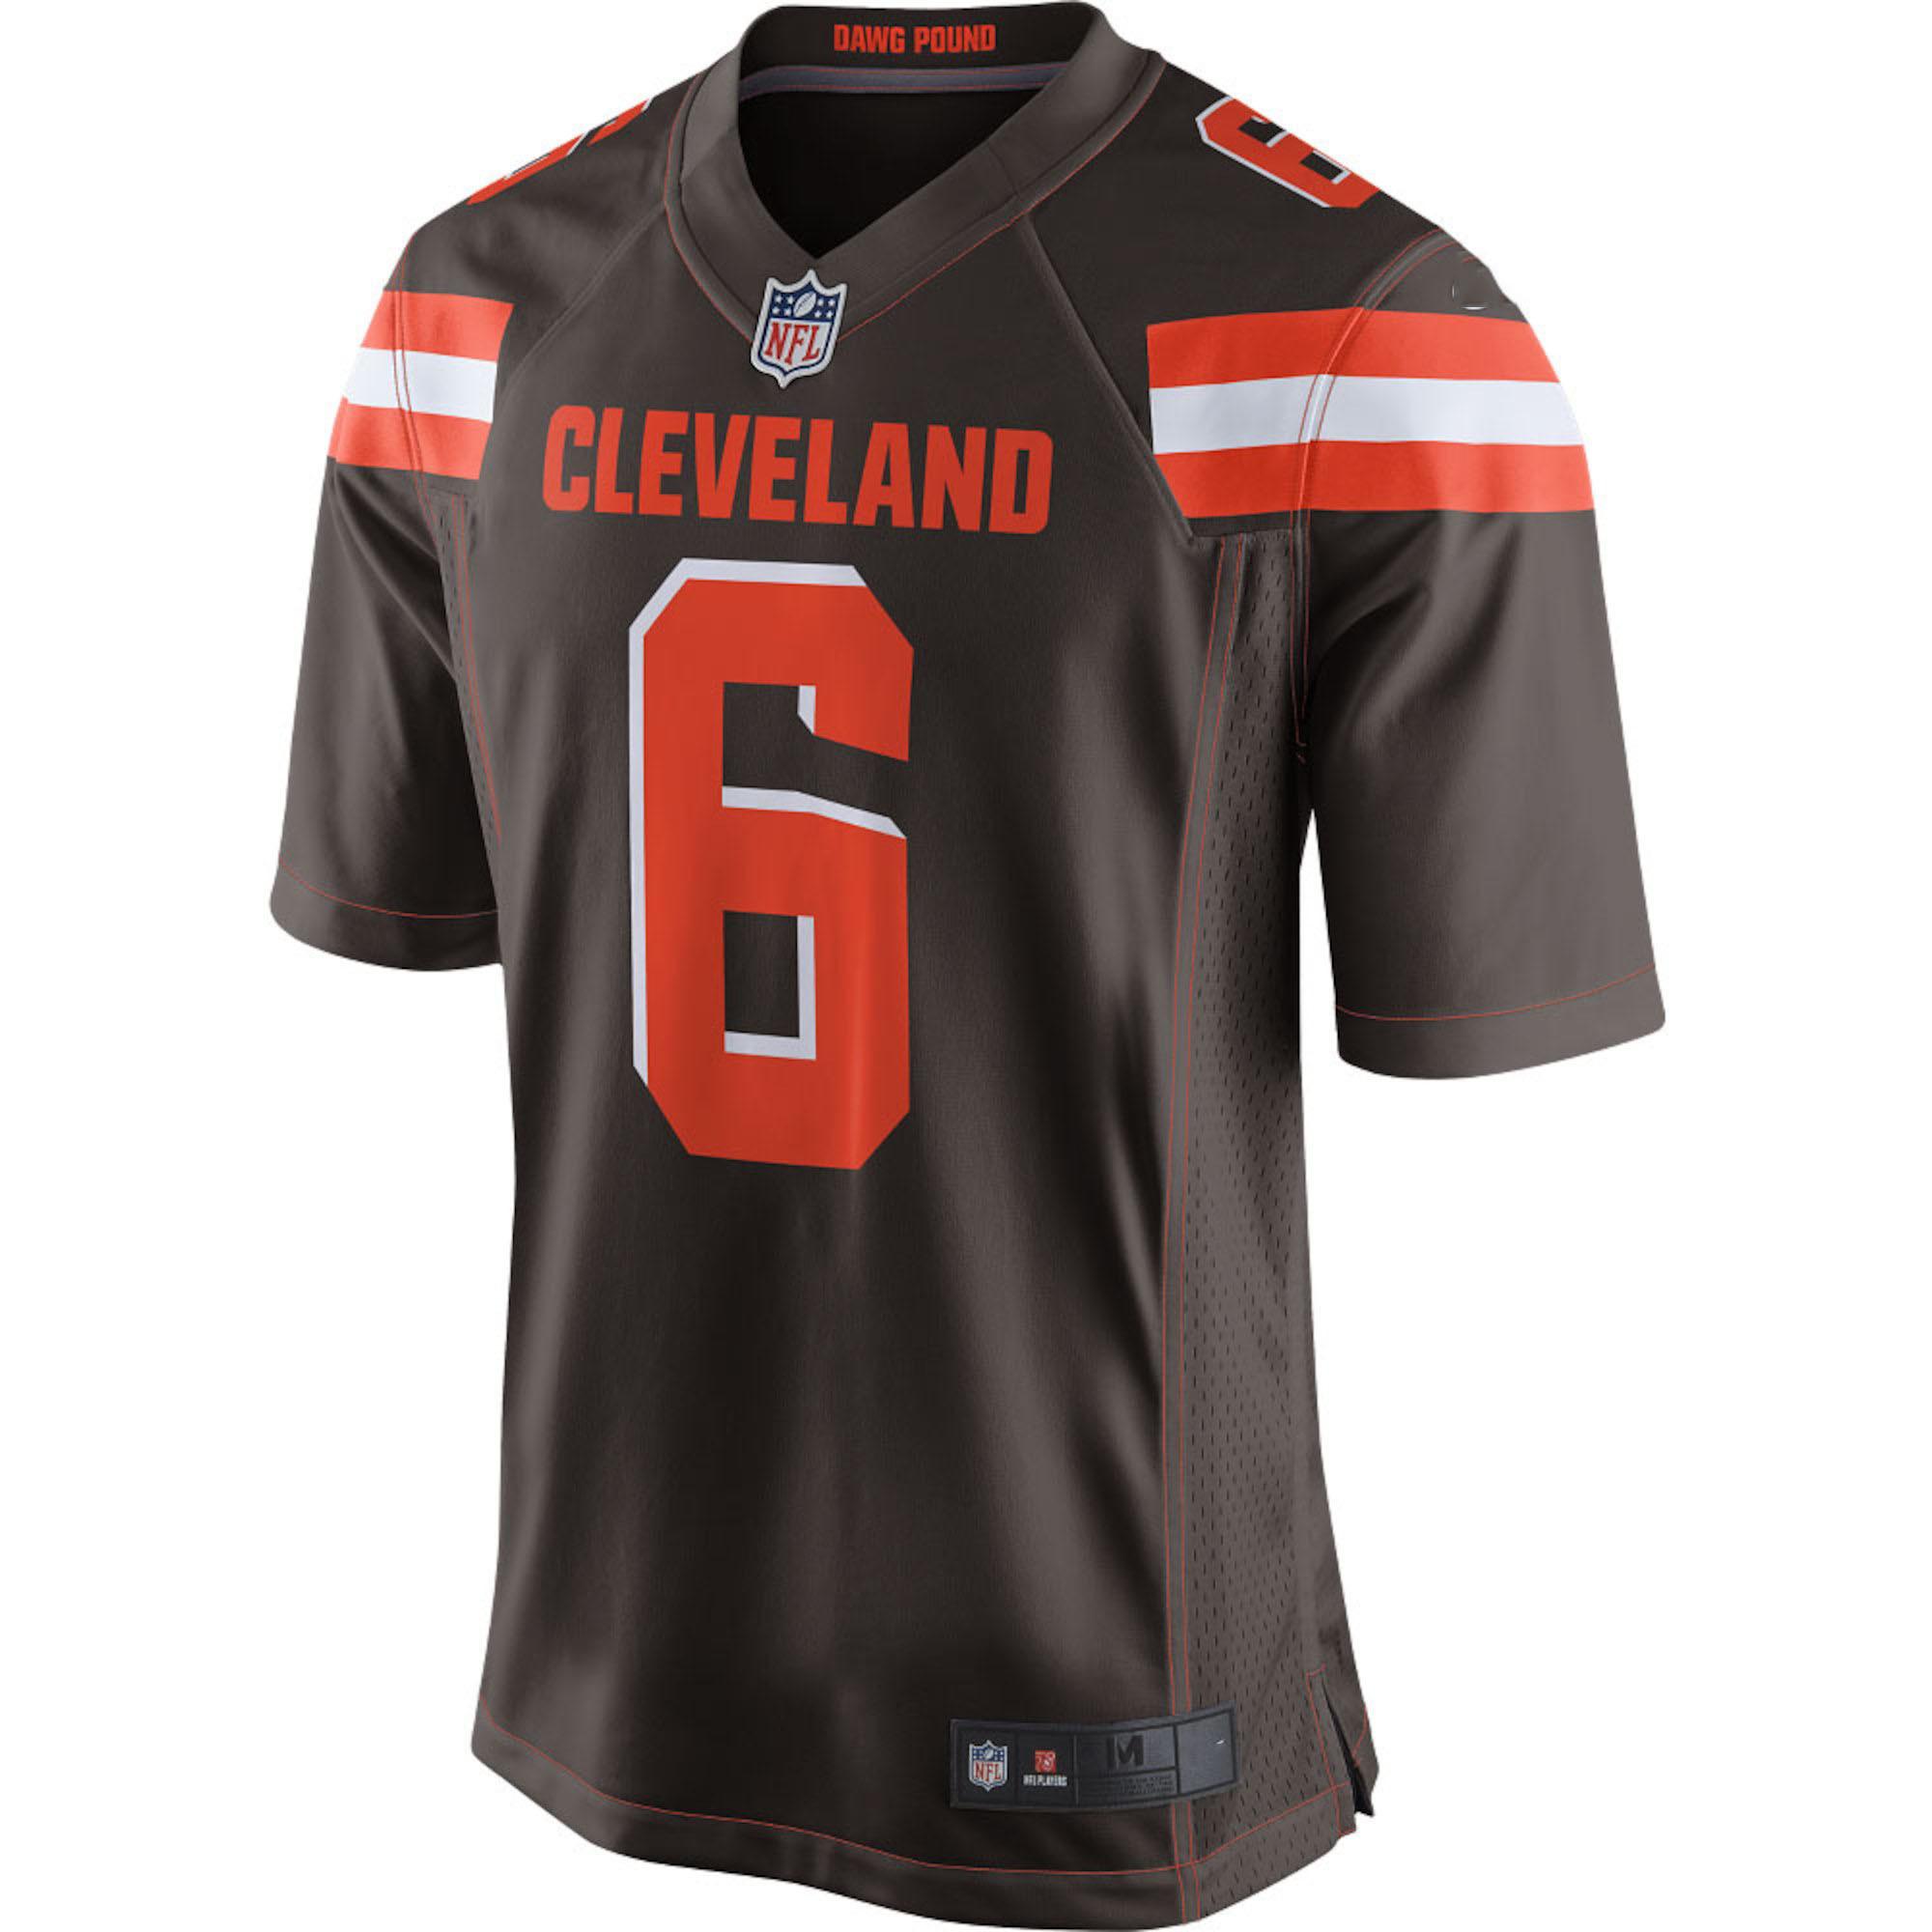 finest selection 79217 e8b41 China Jets Sam Darnold #14 Browns Baker Mayfield #6 National ...